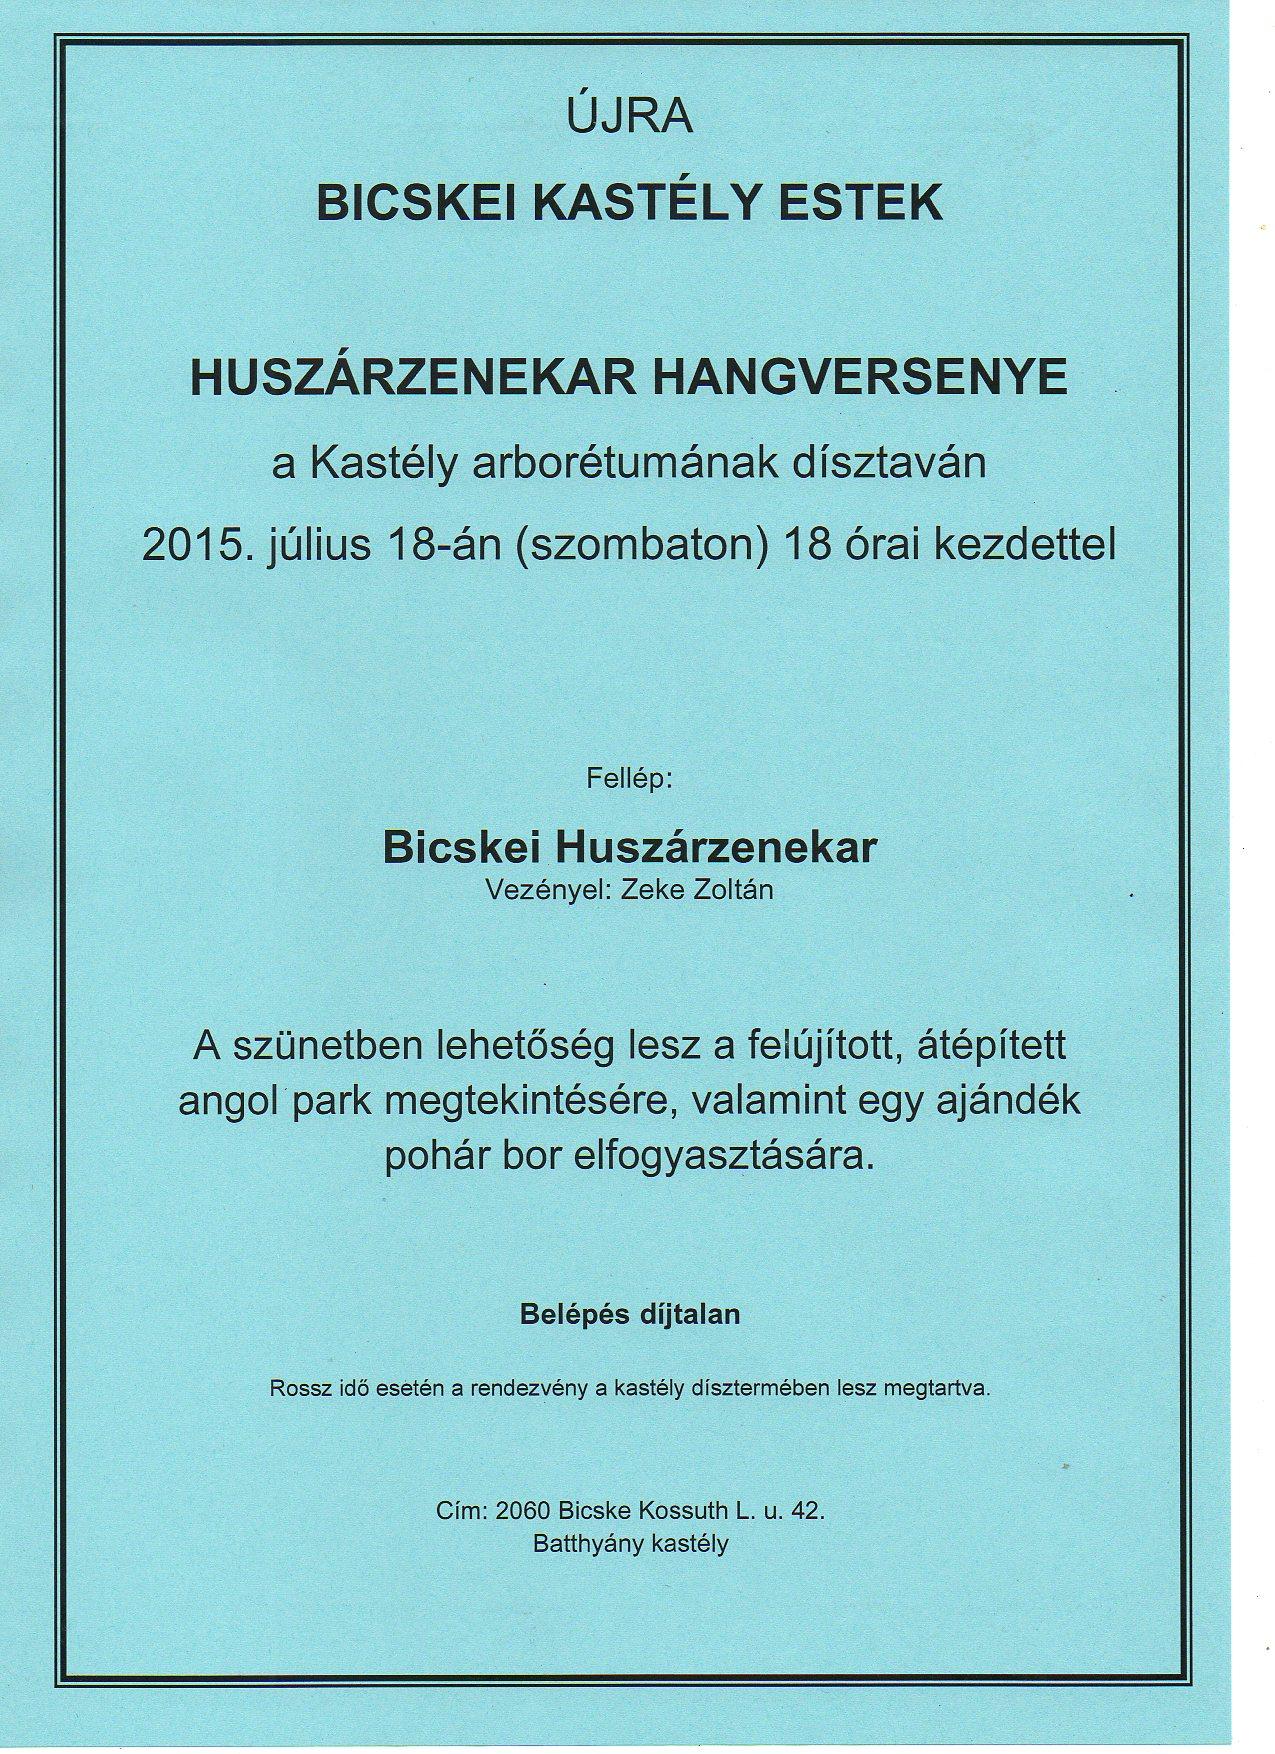 huszarzenekar_hangverseny.jpg